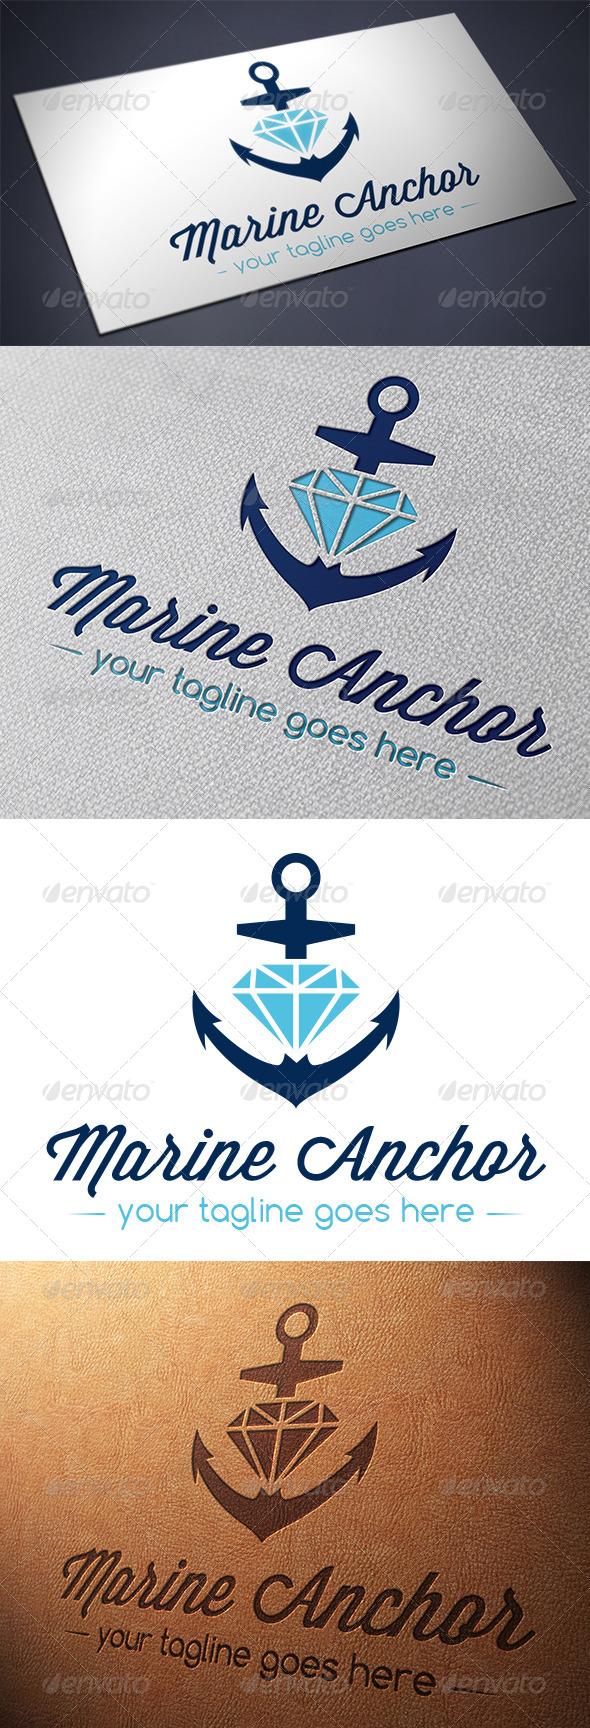 GraphicRiver Marine Anchor Logo Template 5567638